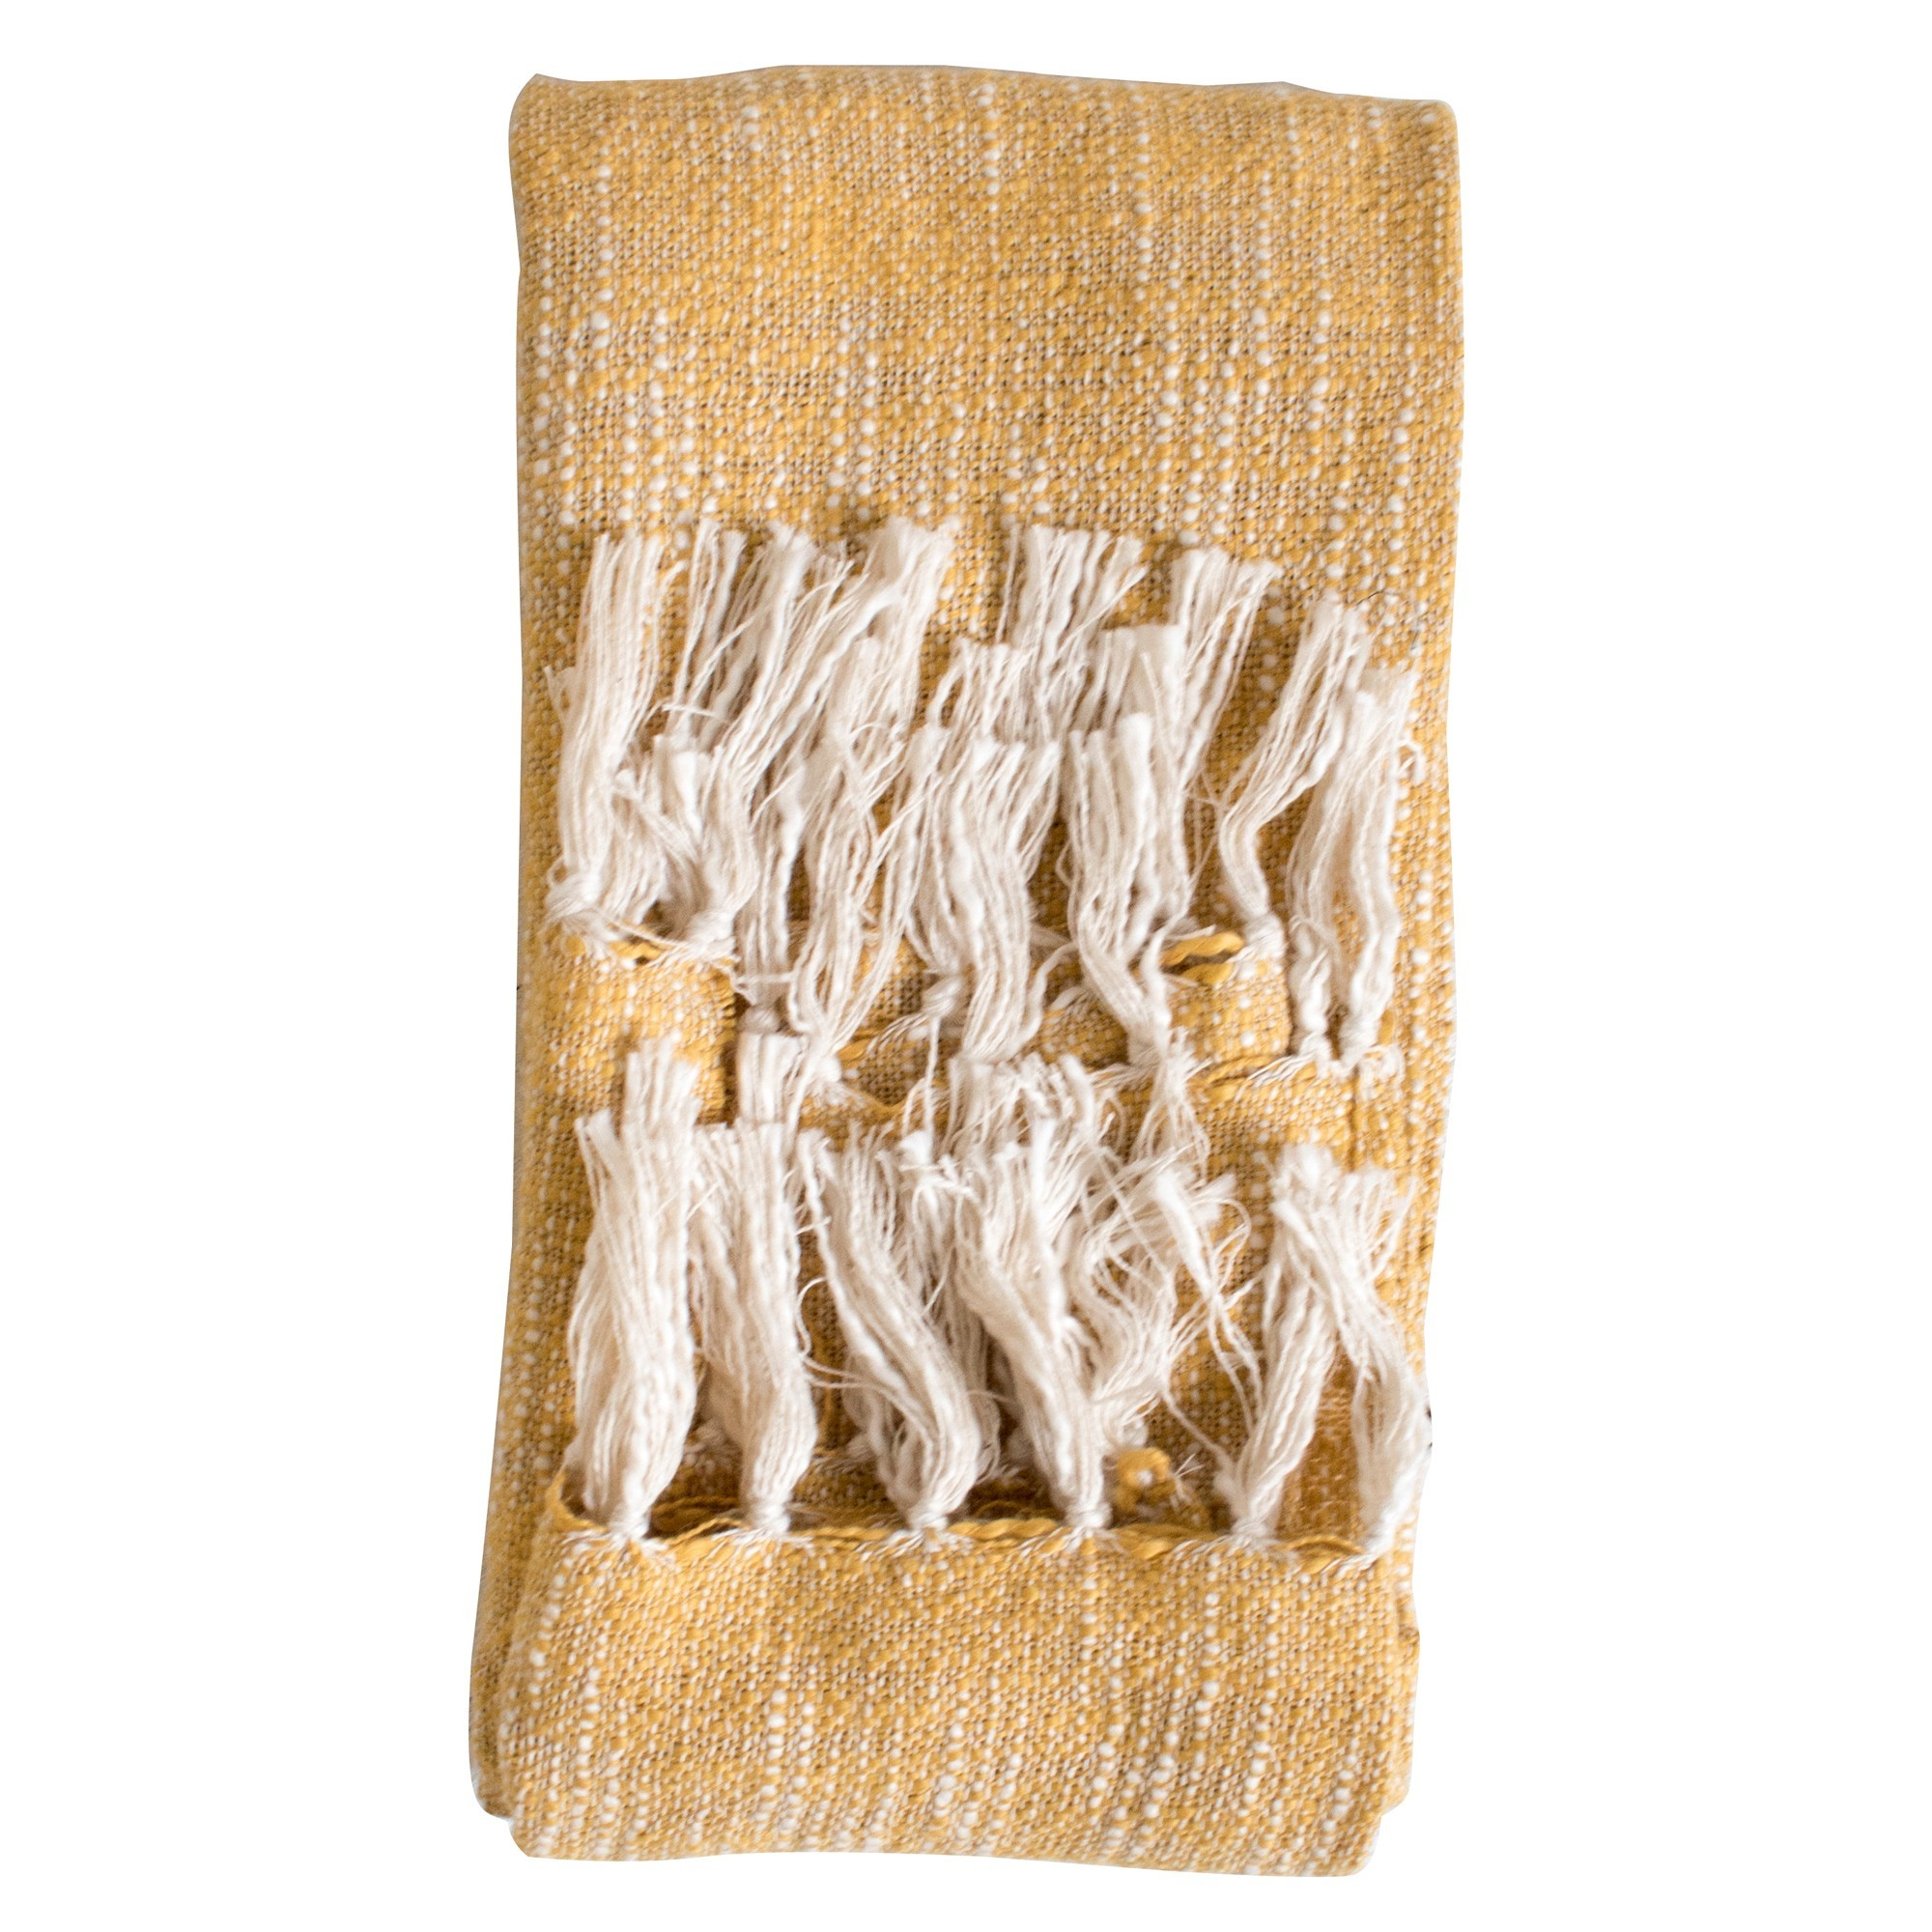 Safa Fringed Cotton Throw, Ochre